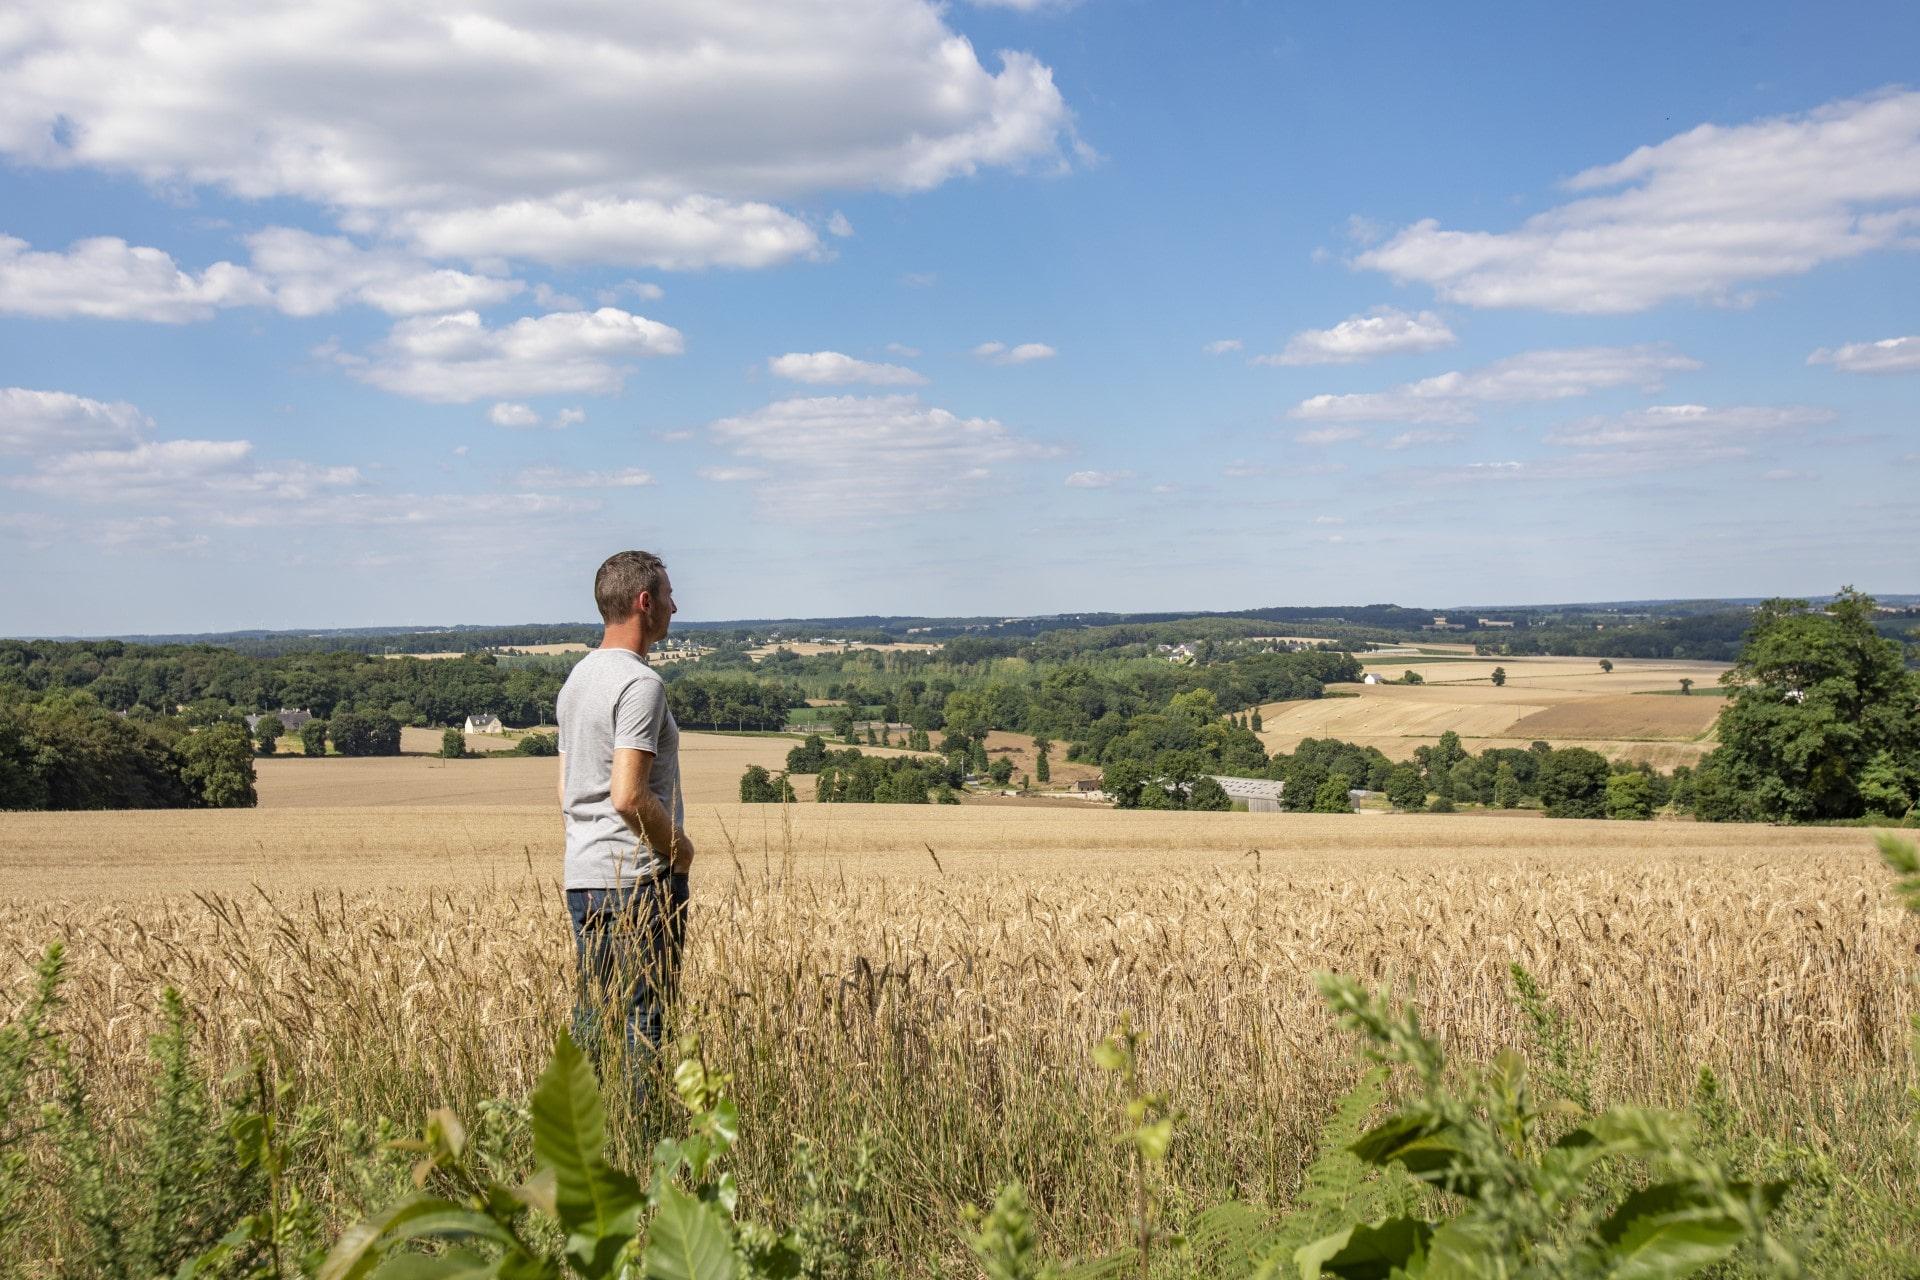 Landwirt auf dem Feld.